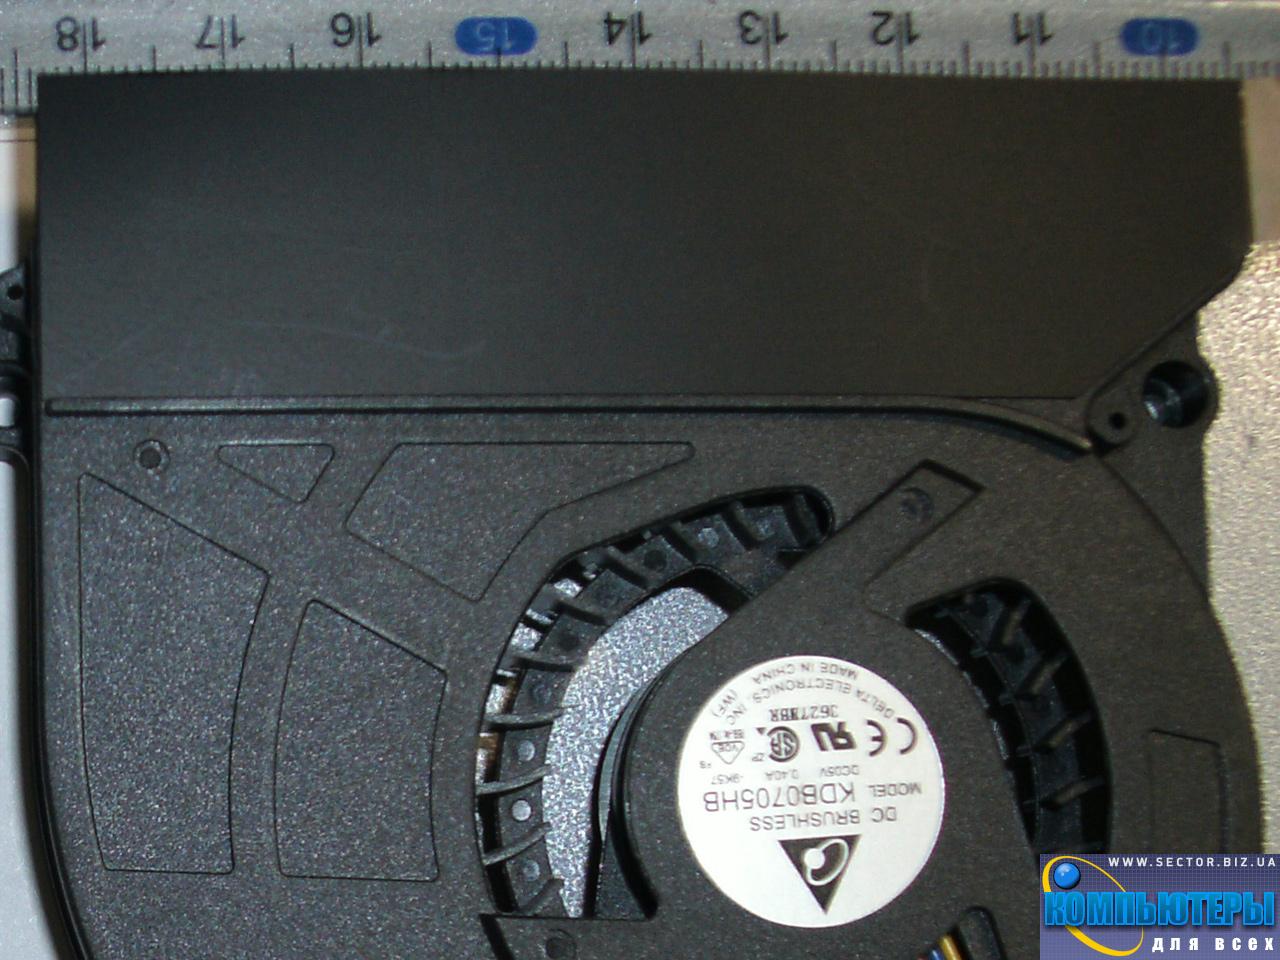 Кулер к ноутбуку Asus X5D X5DI X5DC X5DAF X5 K60 K61IC K70 K70AB K70C p/n: KDB0705HB-9K57. Фото № 1.